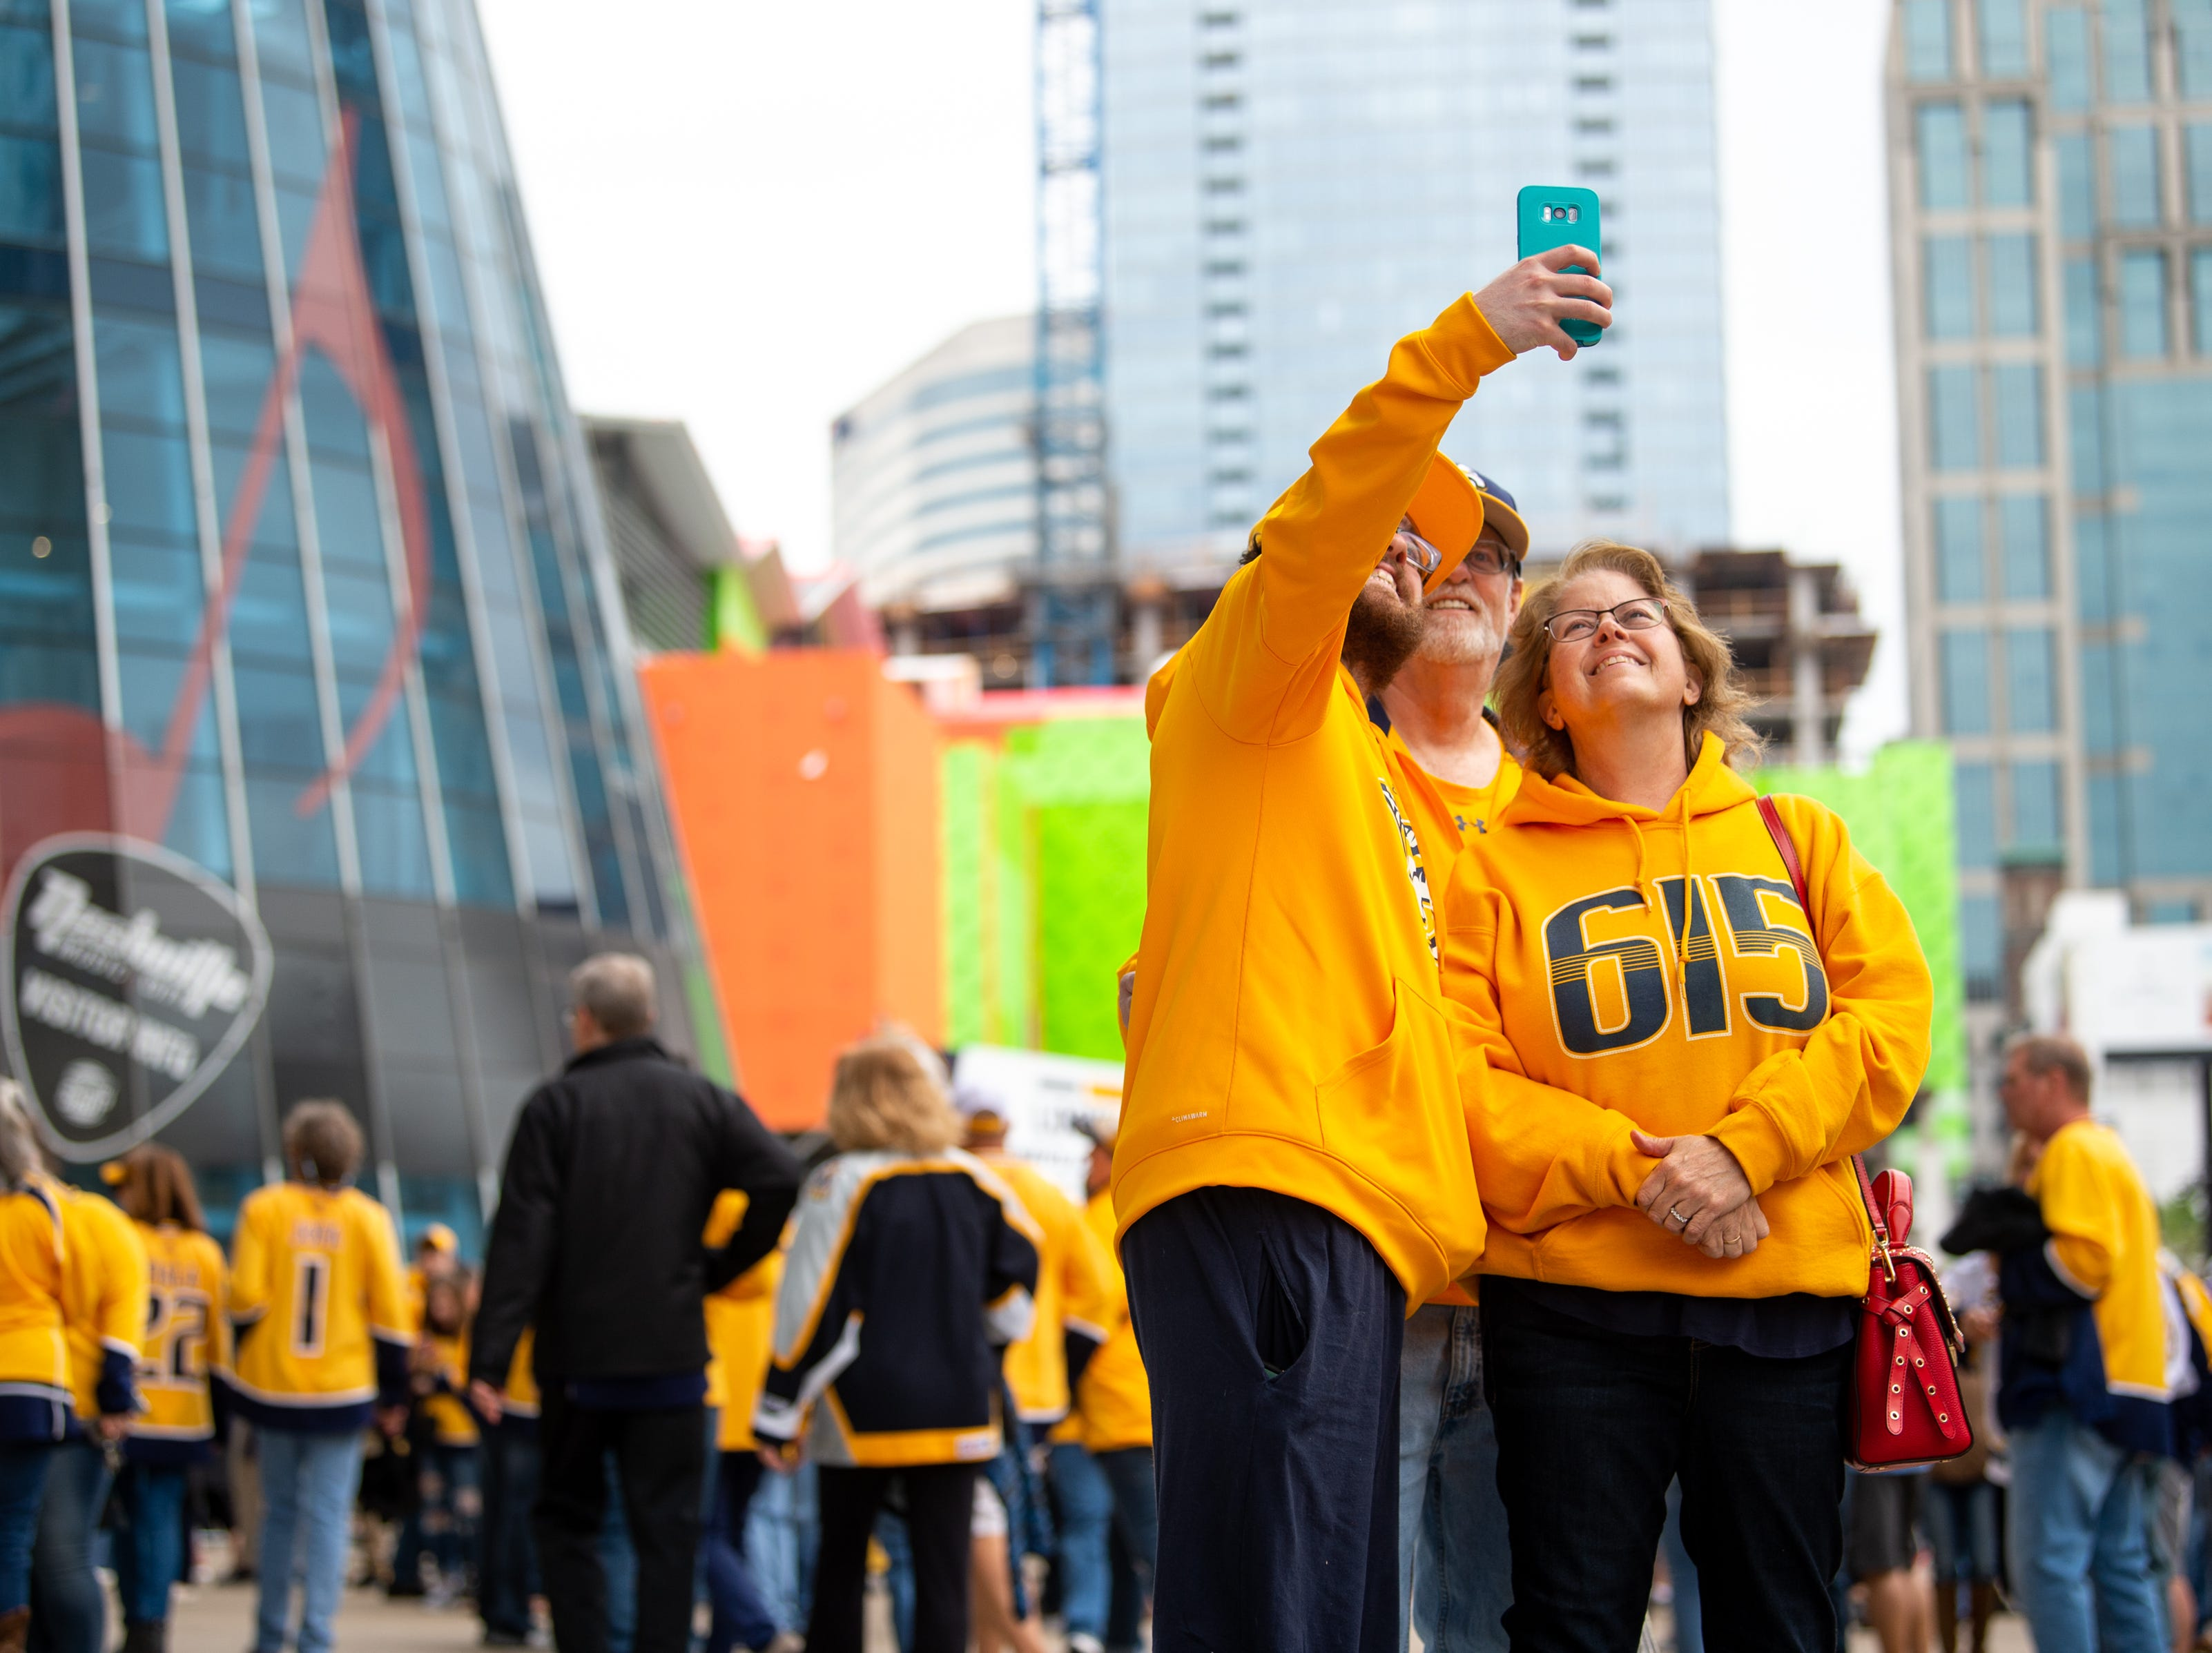 Fans take a selfie before the Nashville Predators game against the Dallas Stars at Bridgestone Arena Saturday, April 13, 2019, in Nashville, Tenn.